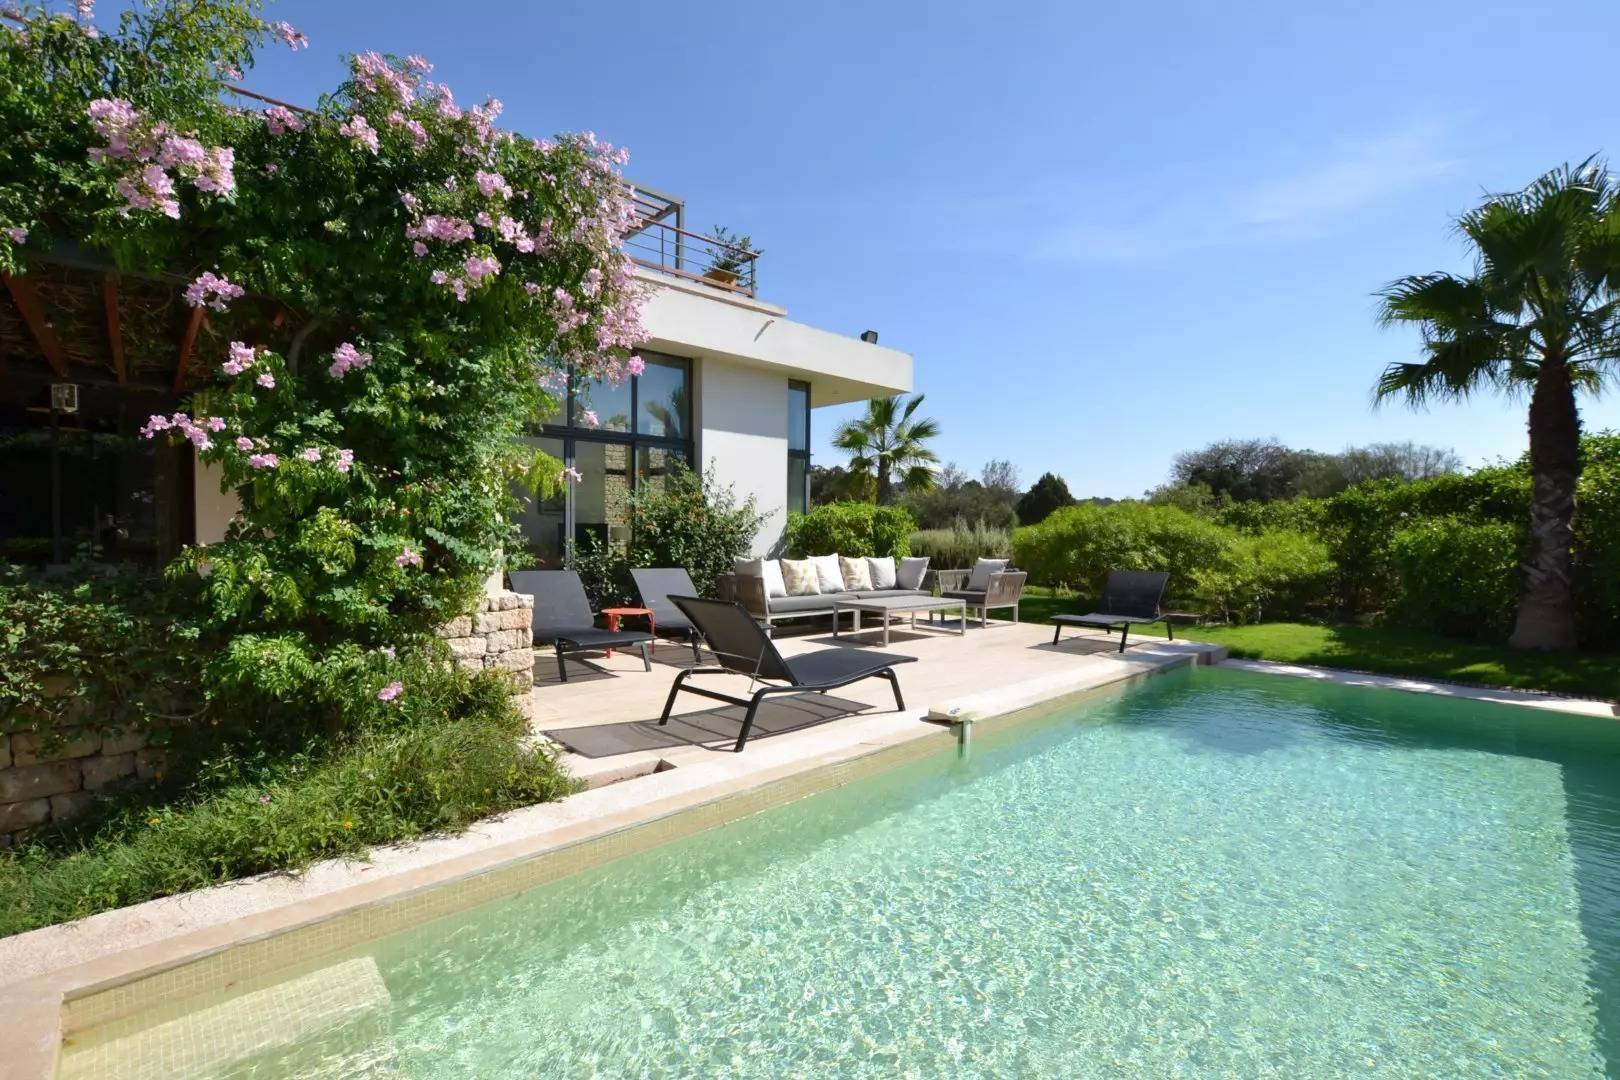 location villa piscine chauffée essaouira (3).jpg